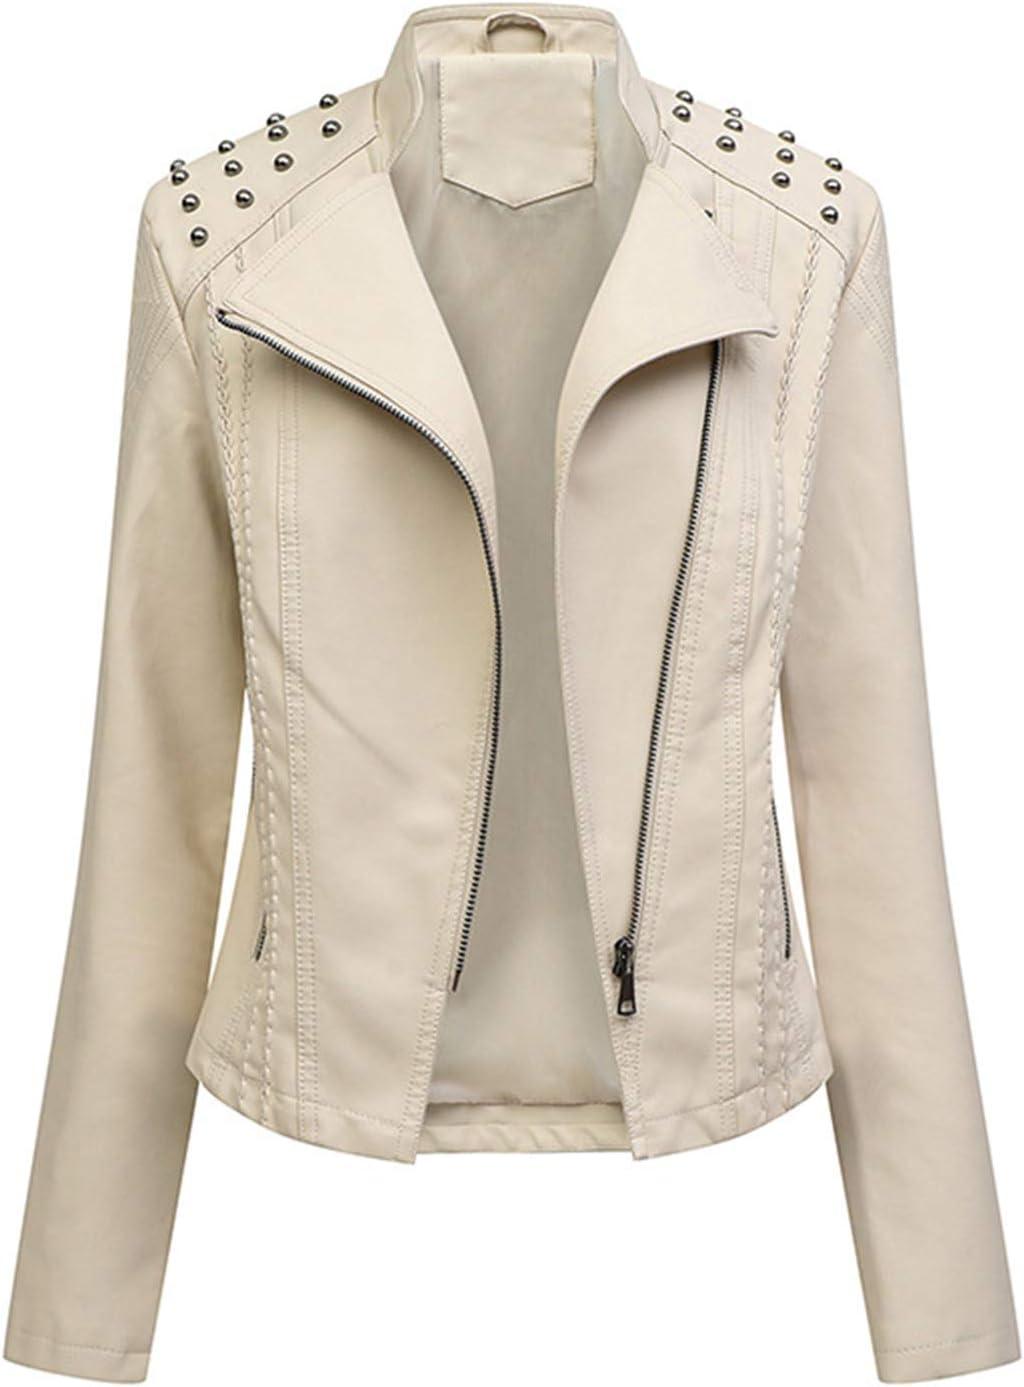 Women's PU Leather Jacket, Faux Moto Biker Slim Fit Jacket with Zip Pockets, Outwear Vintage Short Coat for Autumn, Spring